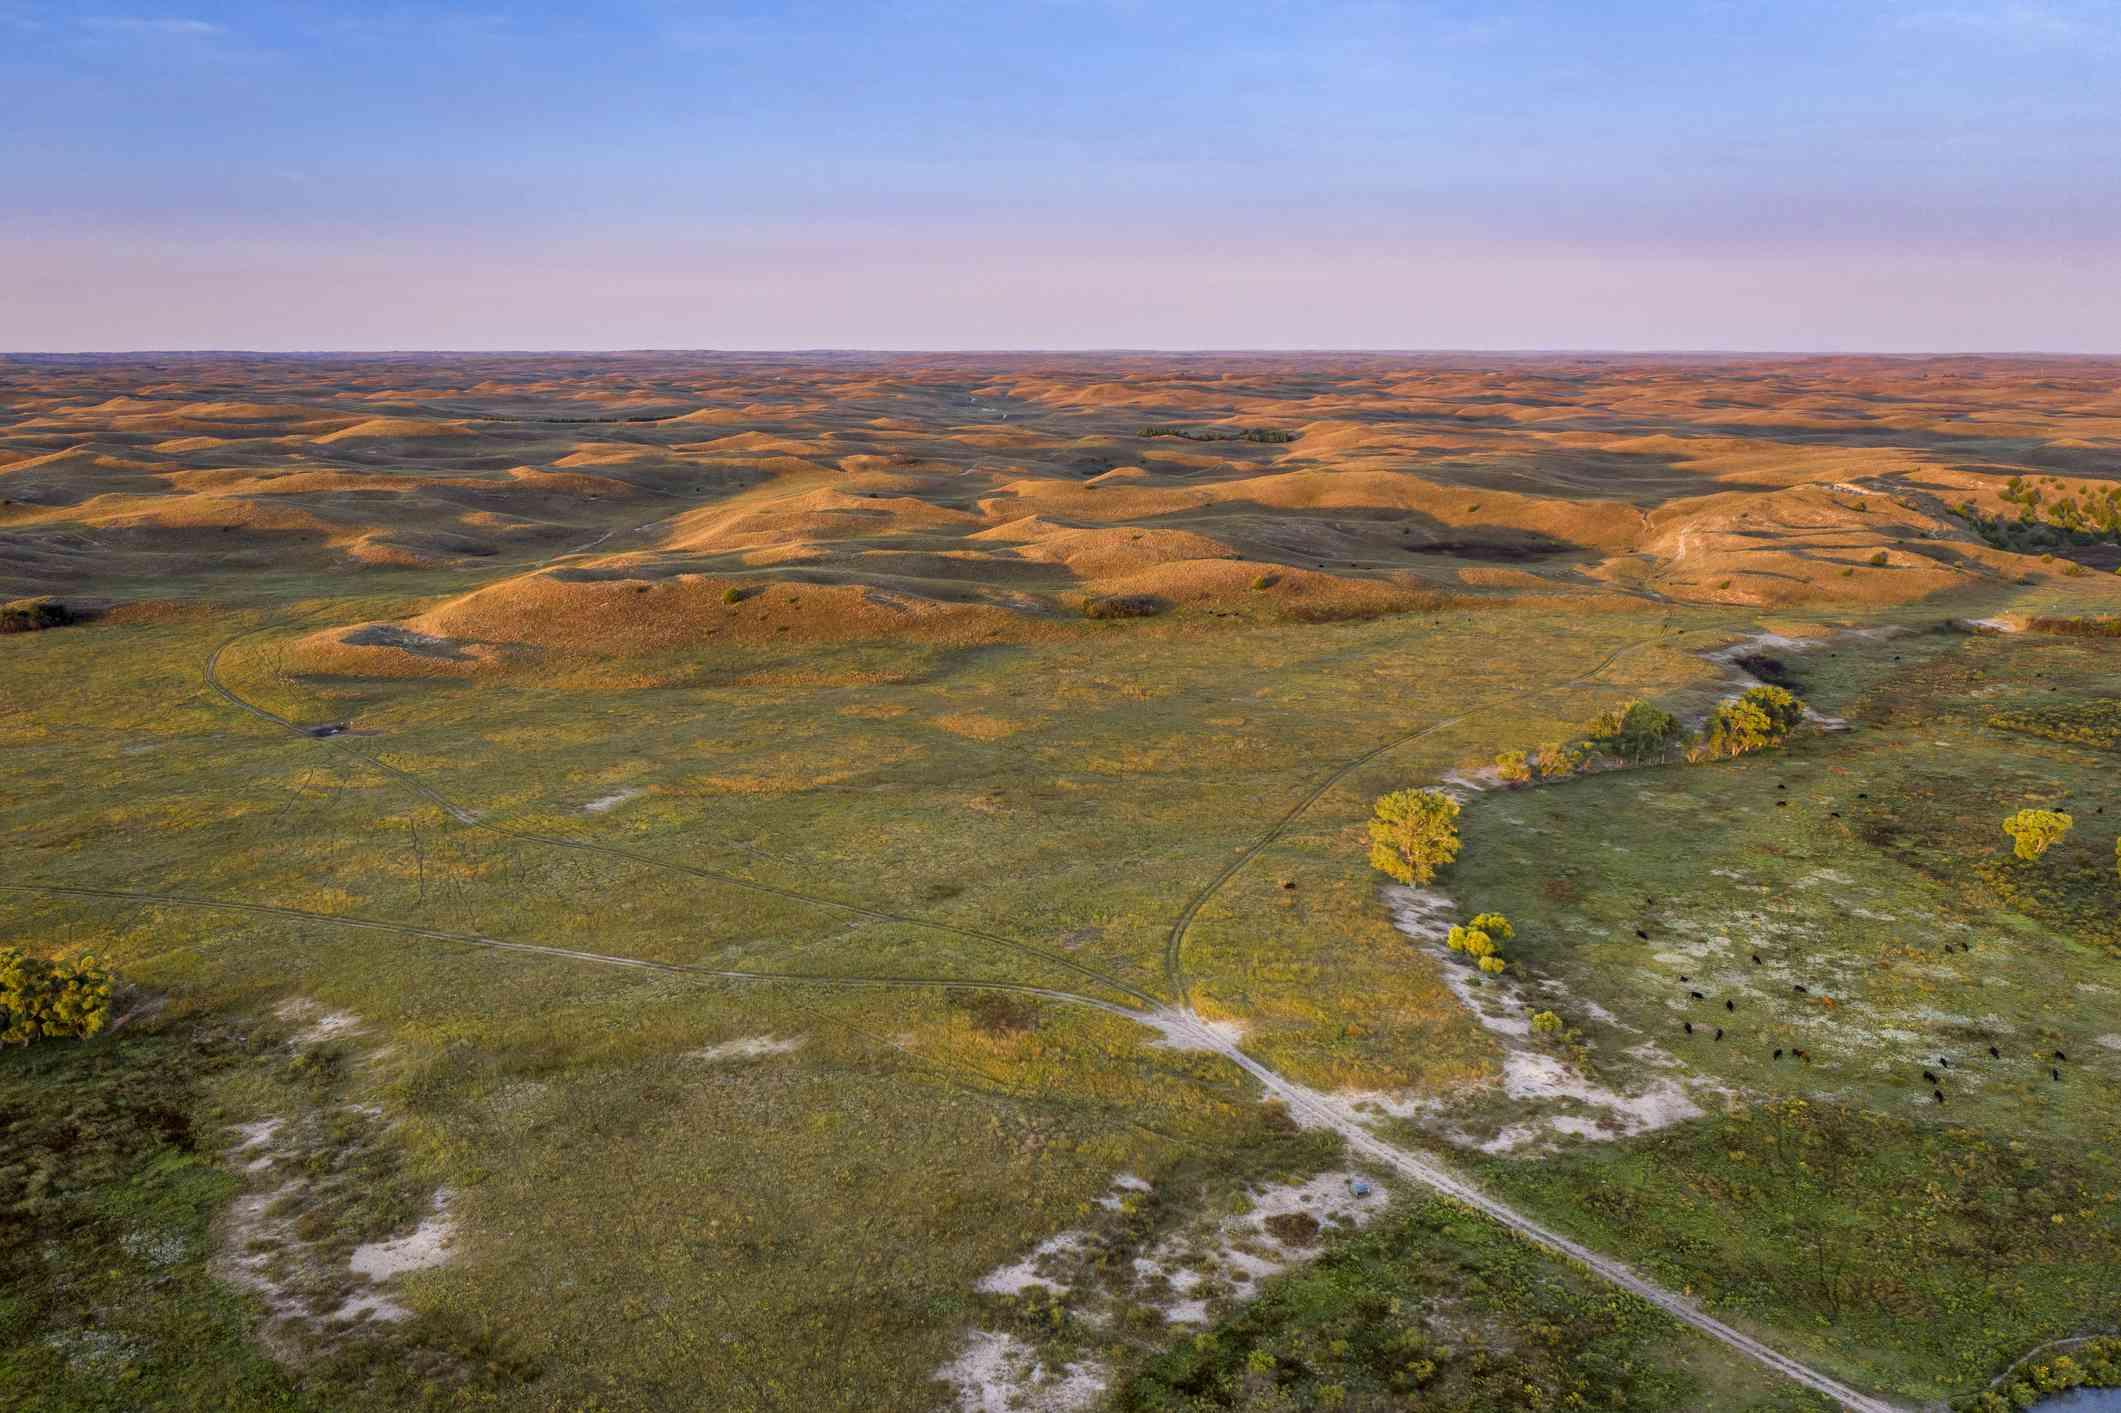 View of Nebraska's Sand Hills, under which the Ogallala Aquifer lies.